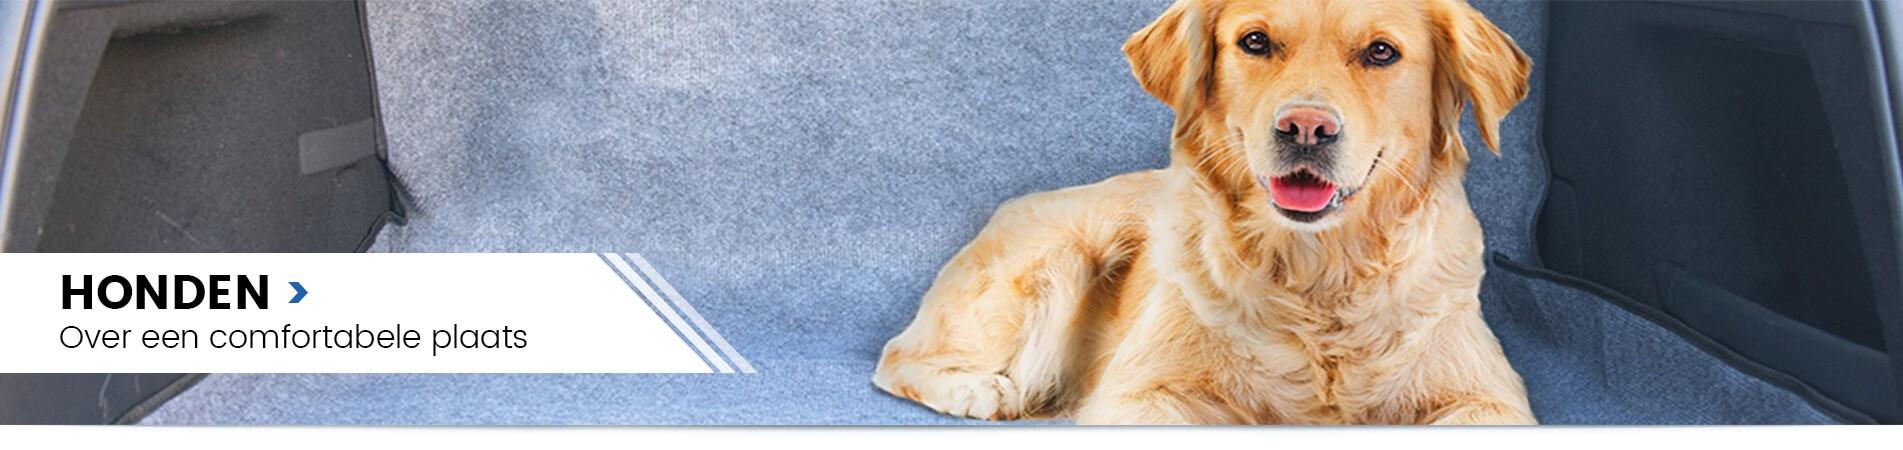 Worldofanimals - Honden